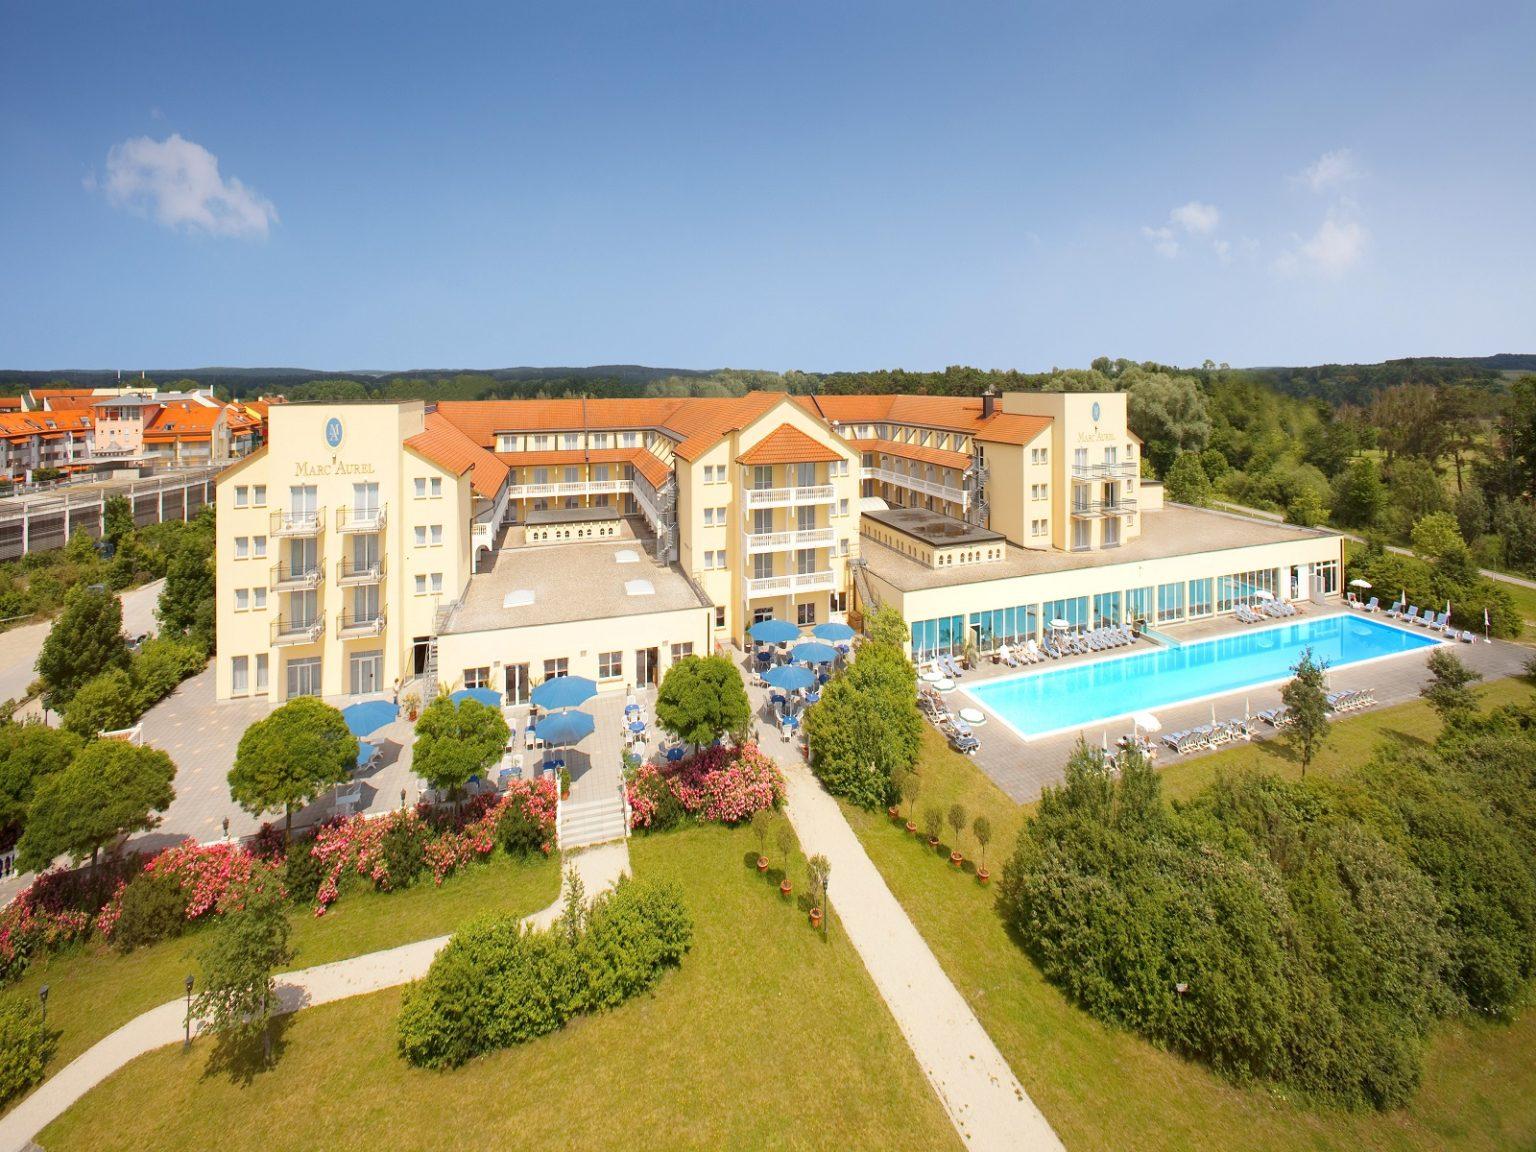 Dorint Marc Aurel Resort Bad Gögging